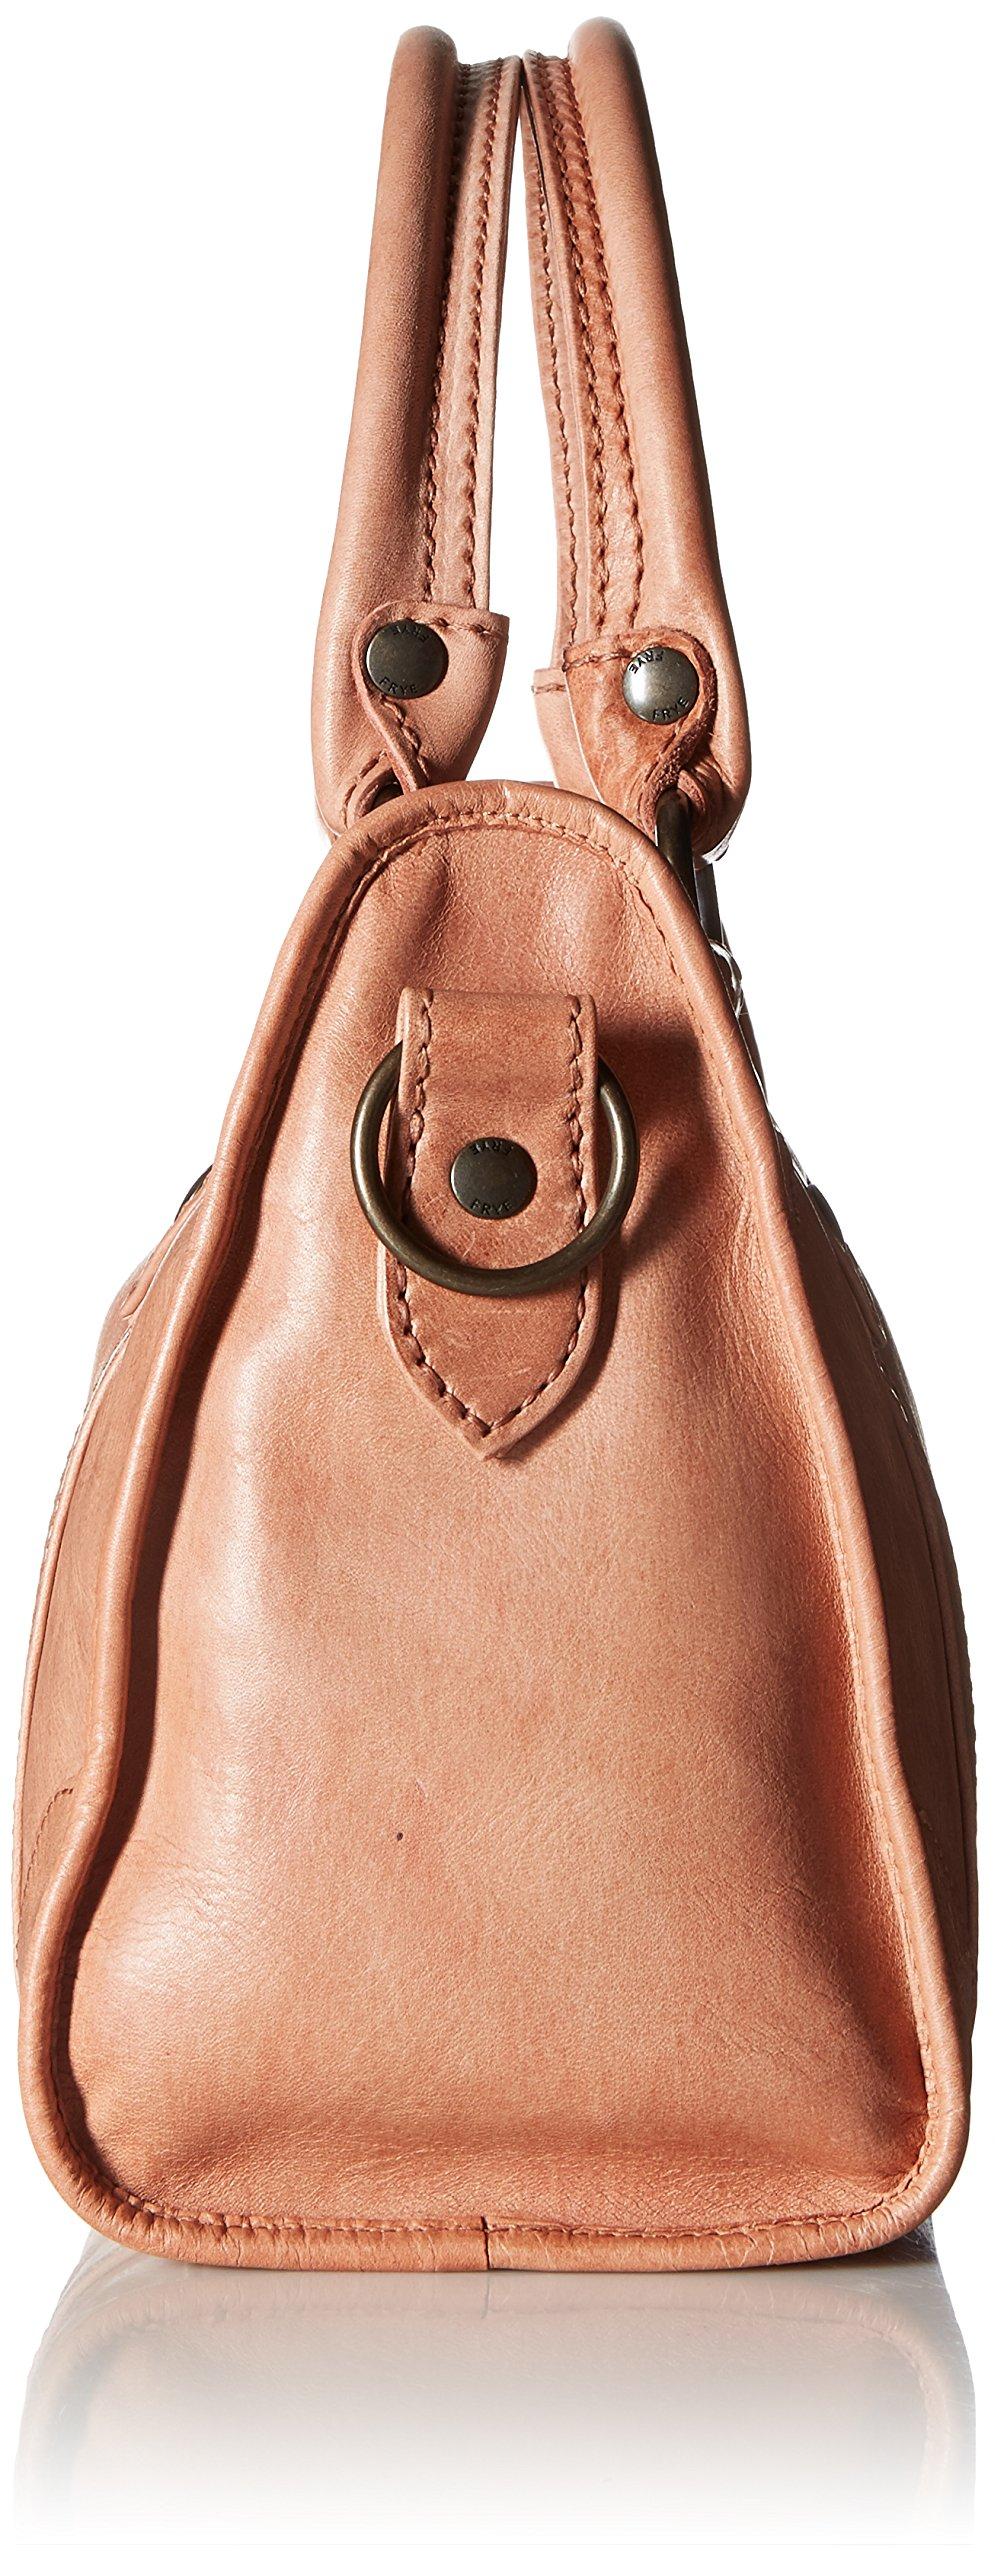 FRYE Melissa Zip Satchel Leather Handbag, dusty rose by FRYE (Image #3)